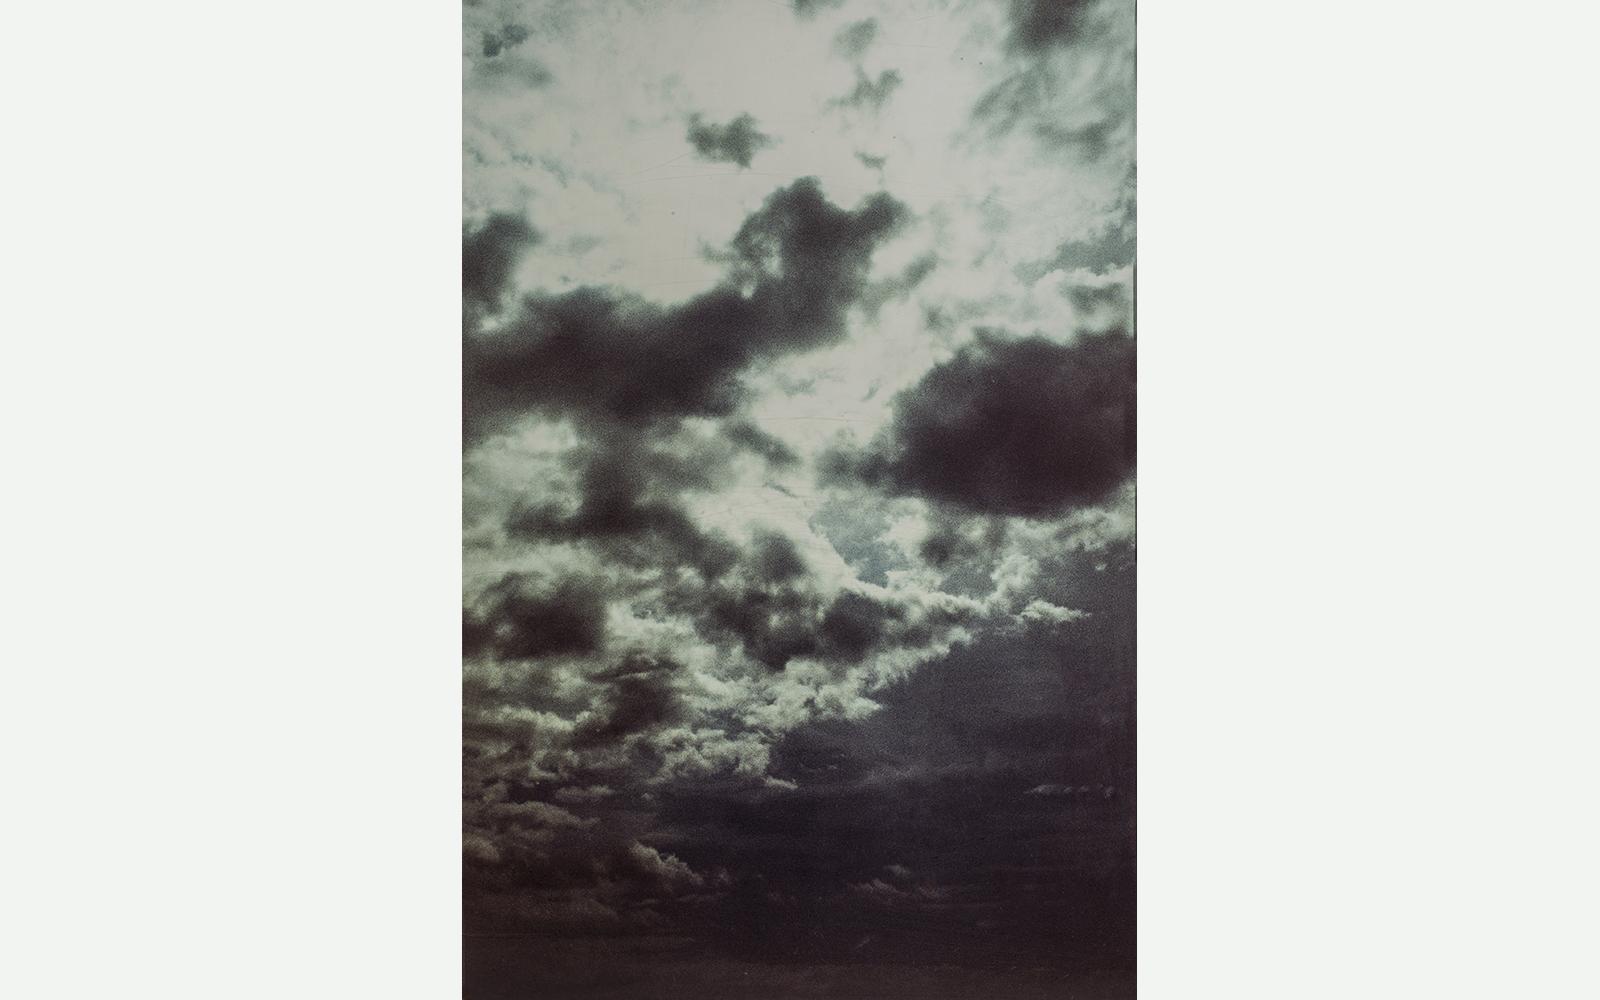 Jes Wind Andersen  Uden titel - Himlen over  Firenze, 2001 Fotografi. 180×132 cm.